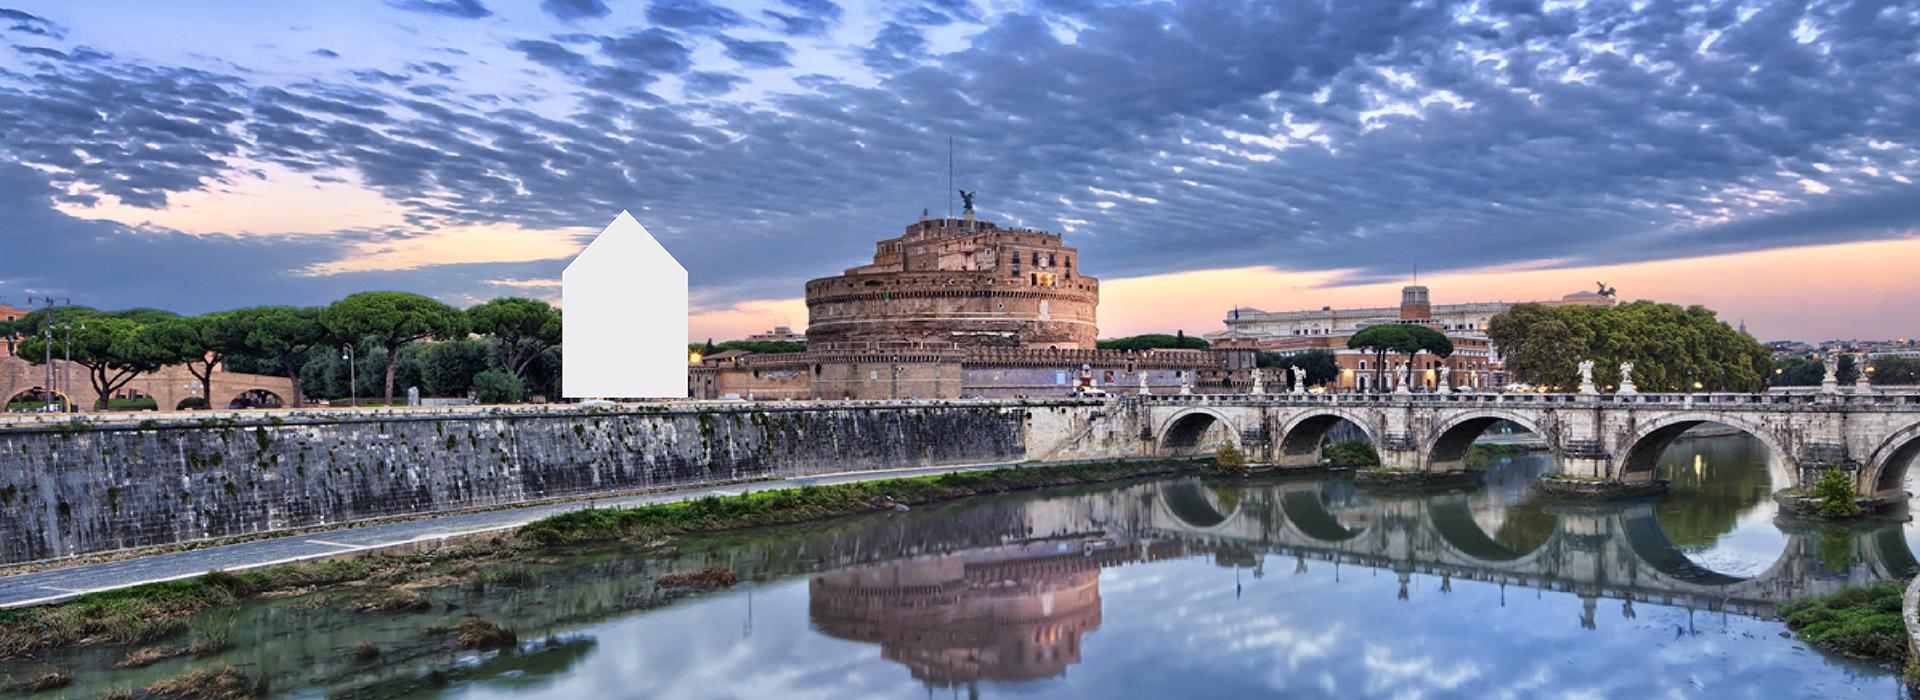 Roma tevere